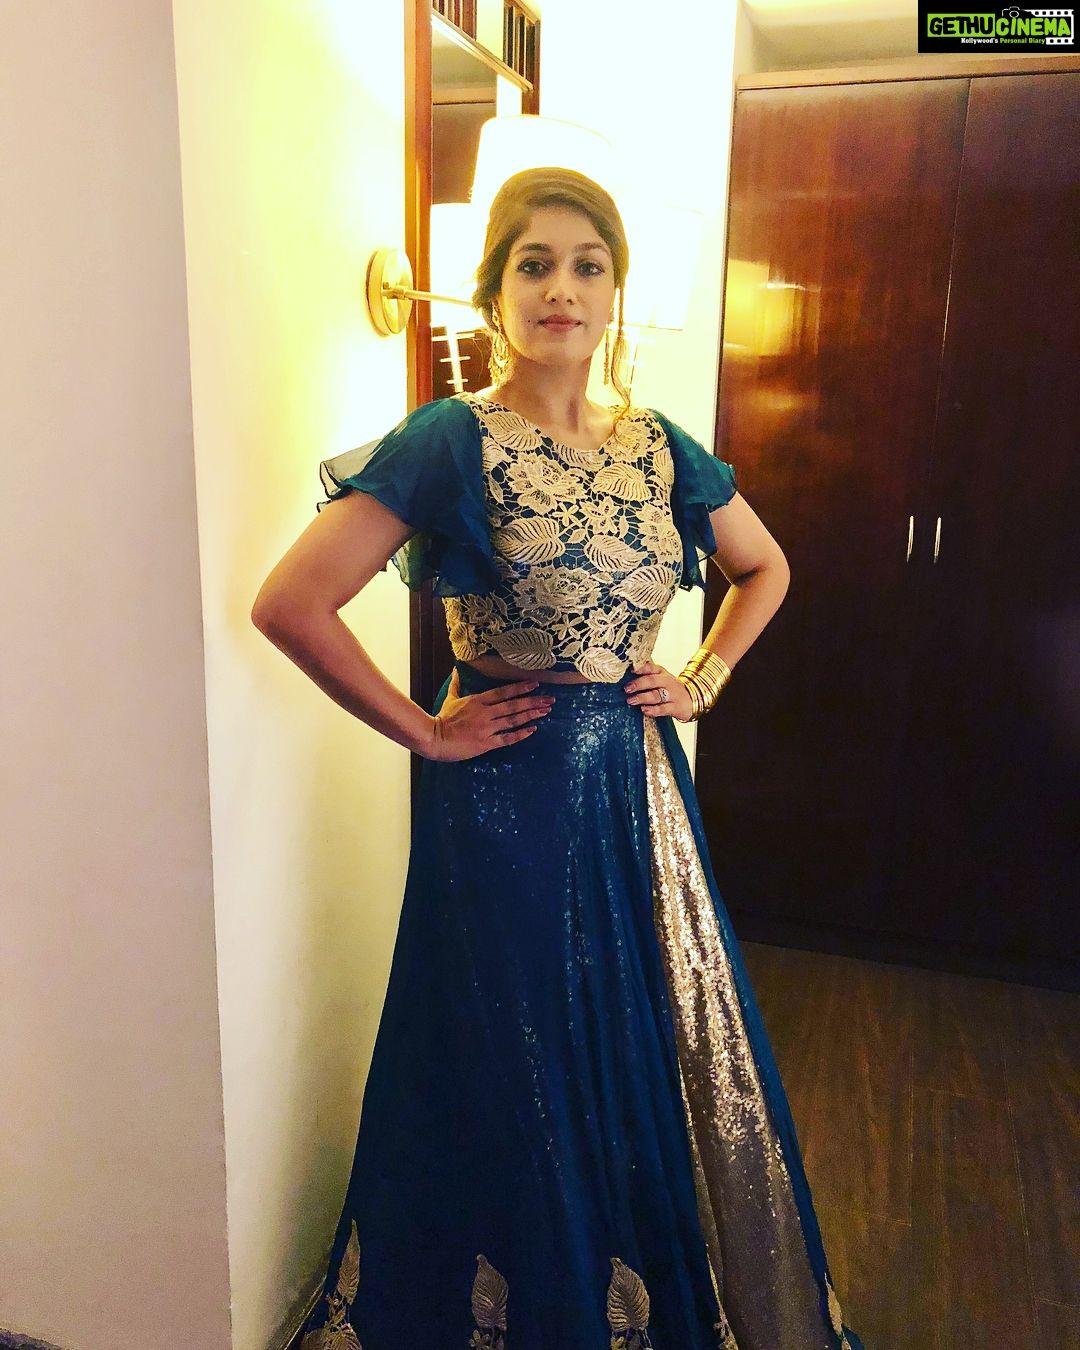 Actress Meghana Raj 2019 Pretty Latest Hd Stills Gethu Cinema Hd Wallpapers For Mobile Stylish Actresses Mobile Wallpaper